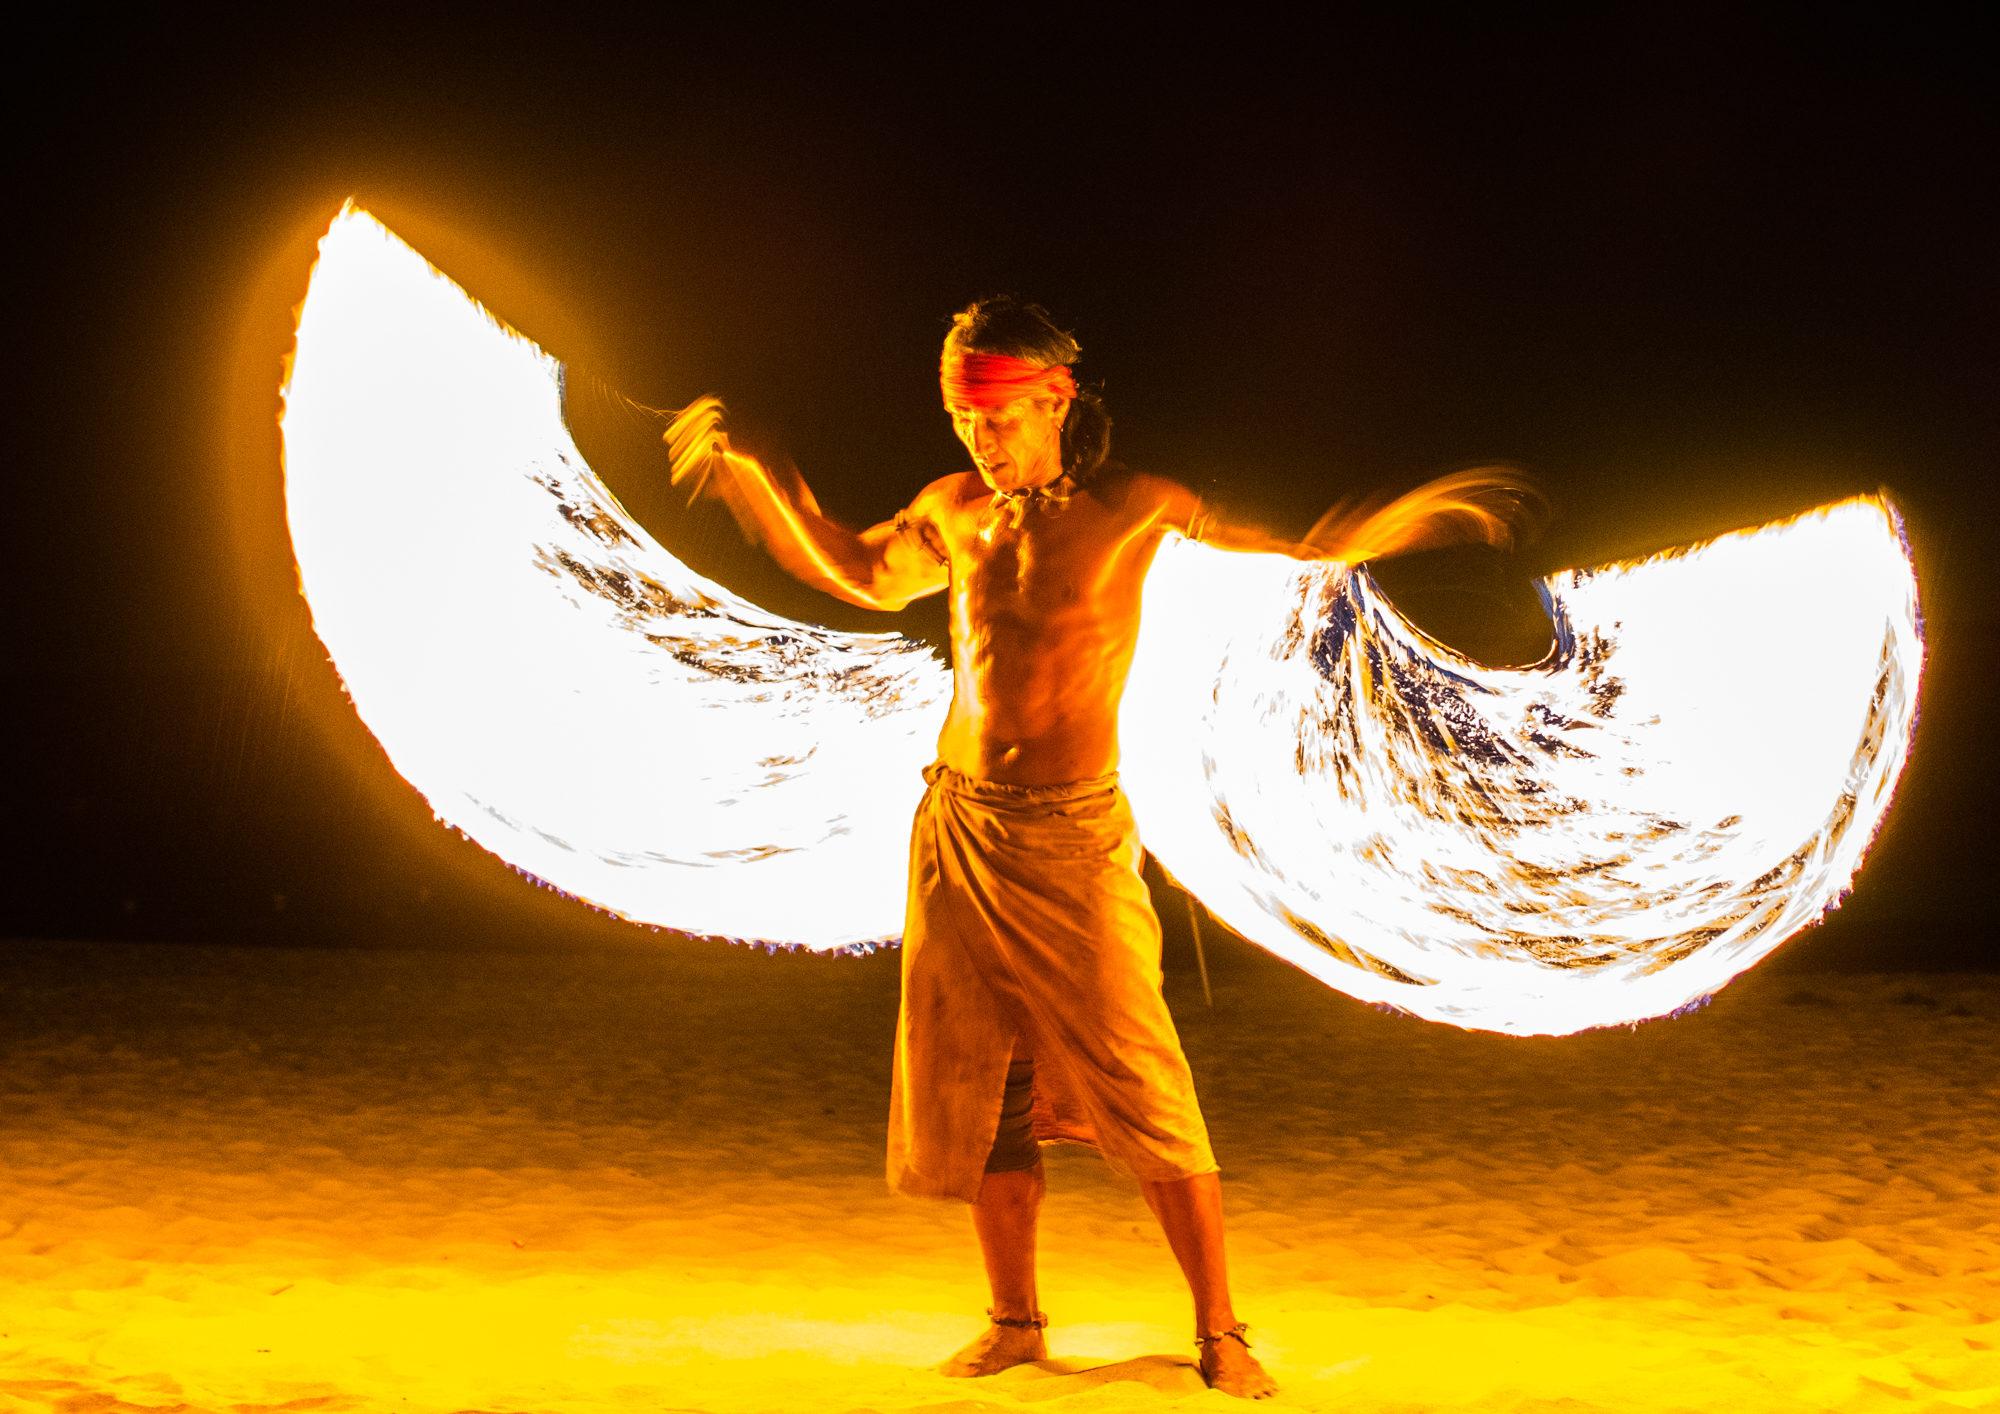 thailand koh lanta fire show